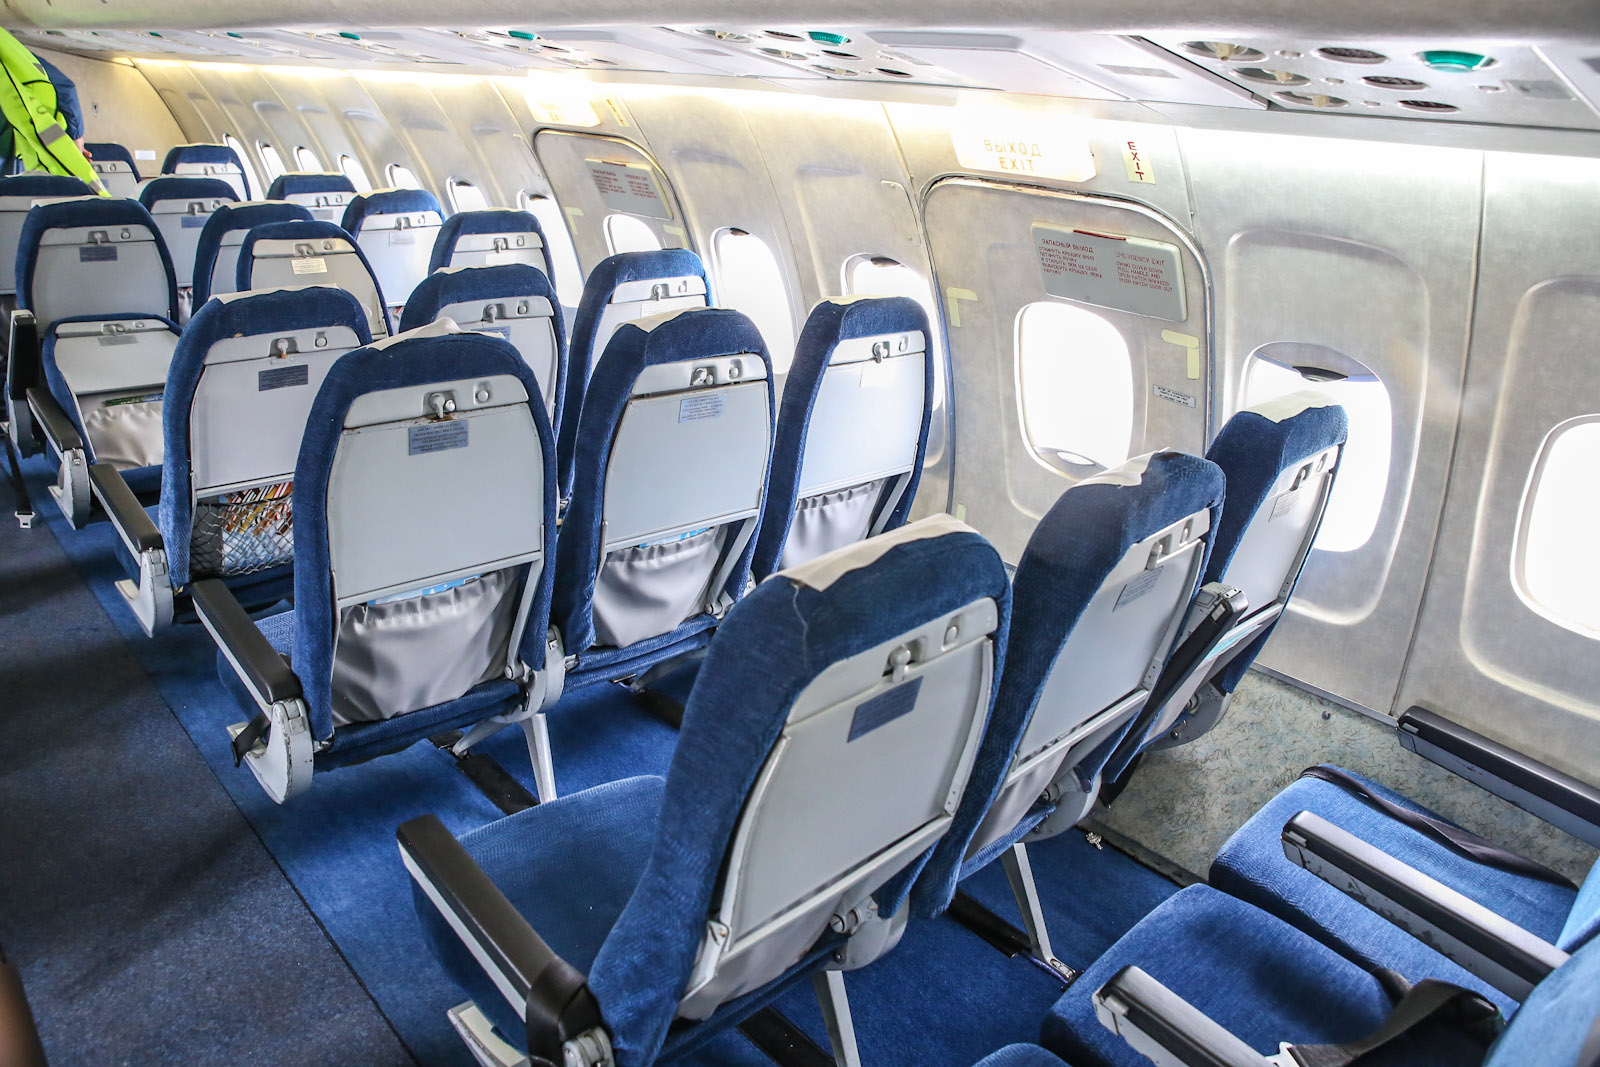 Пассажирский салон самолета Ту-154М авиакомпании